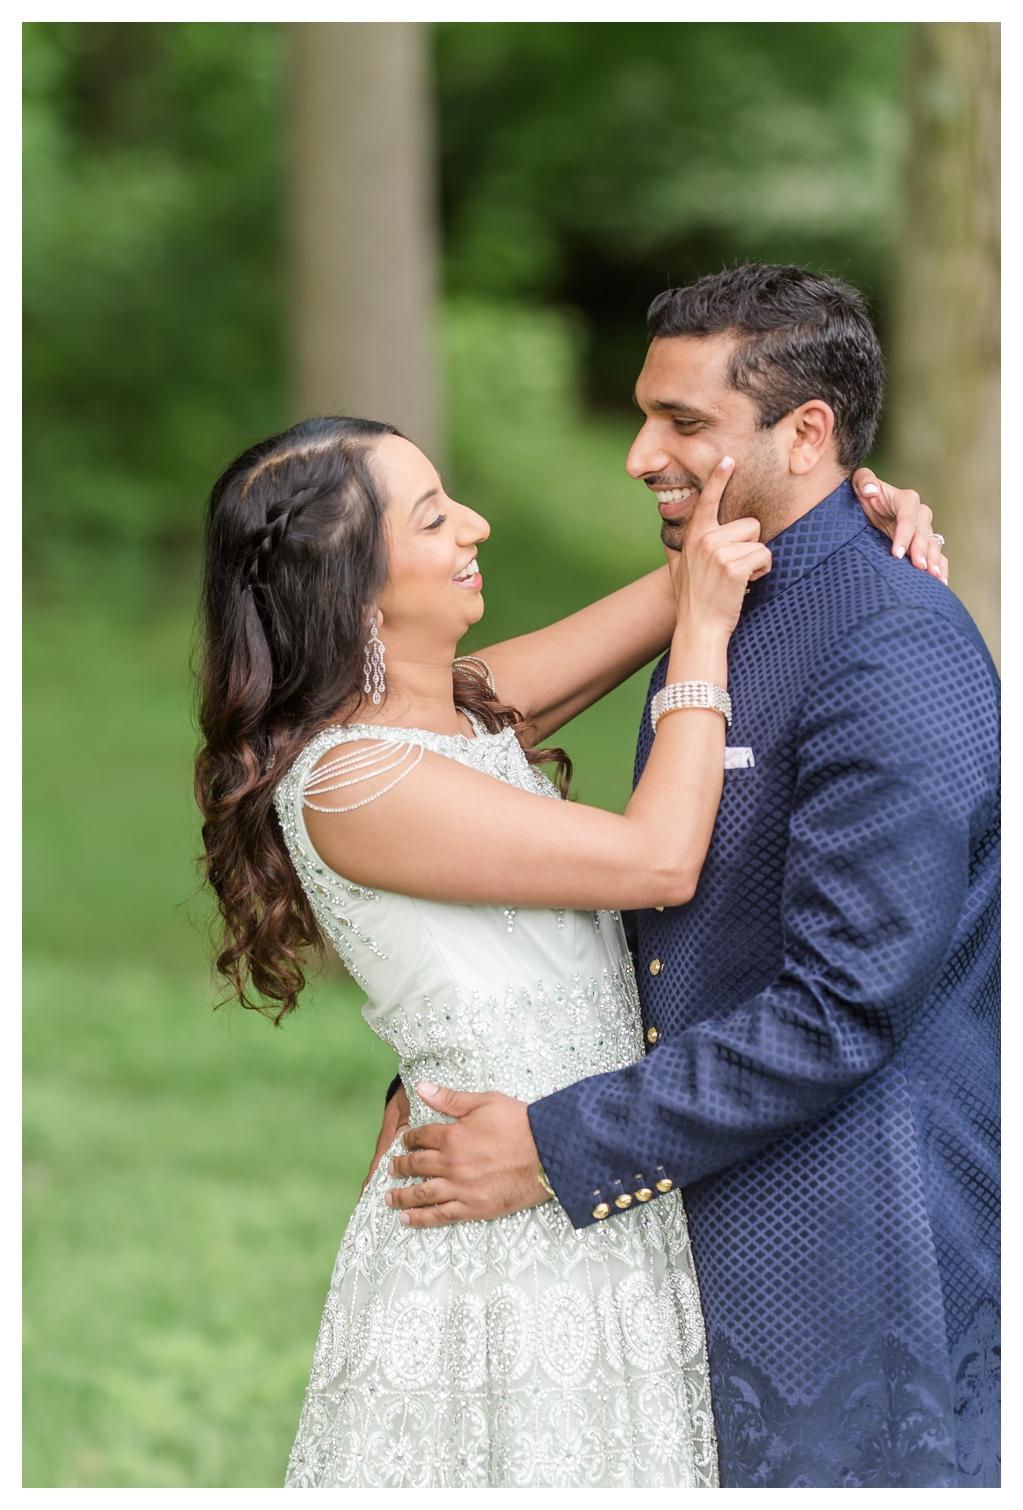 Chicago Indian Hindu Wedding Photographer_0511.jpg